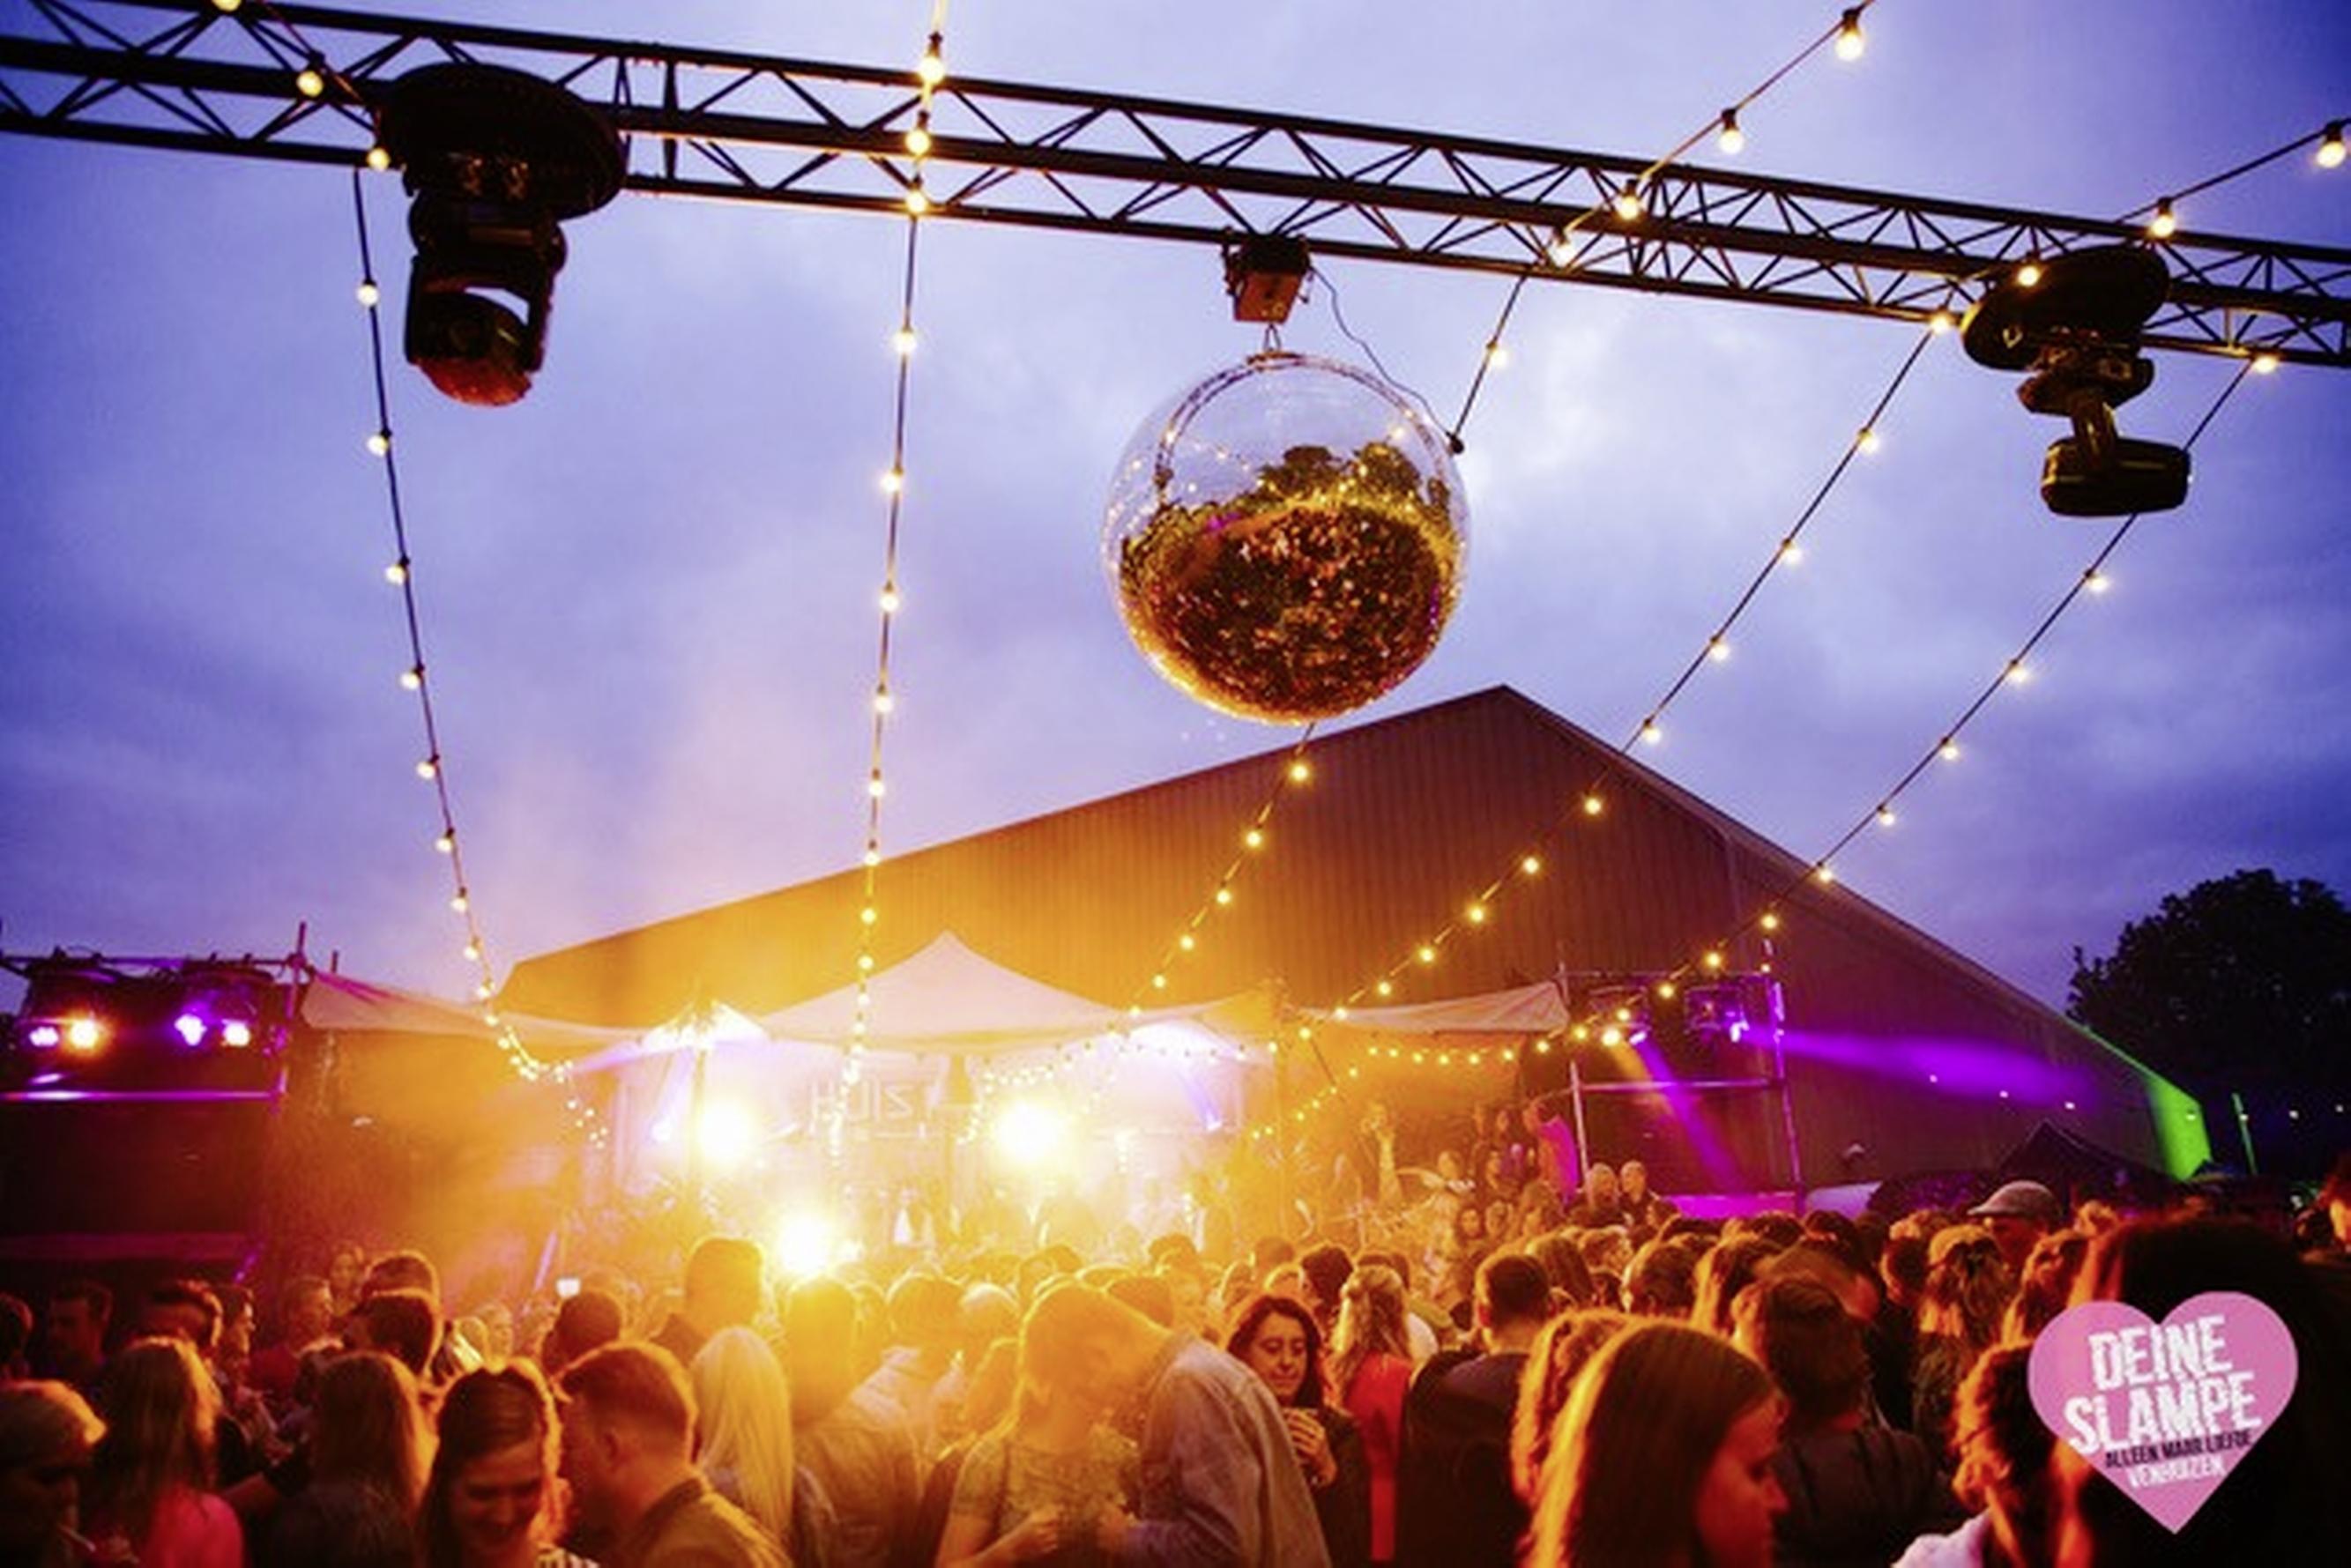 Deine Slampe heropent het Westfriese festival seizoen!